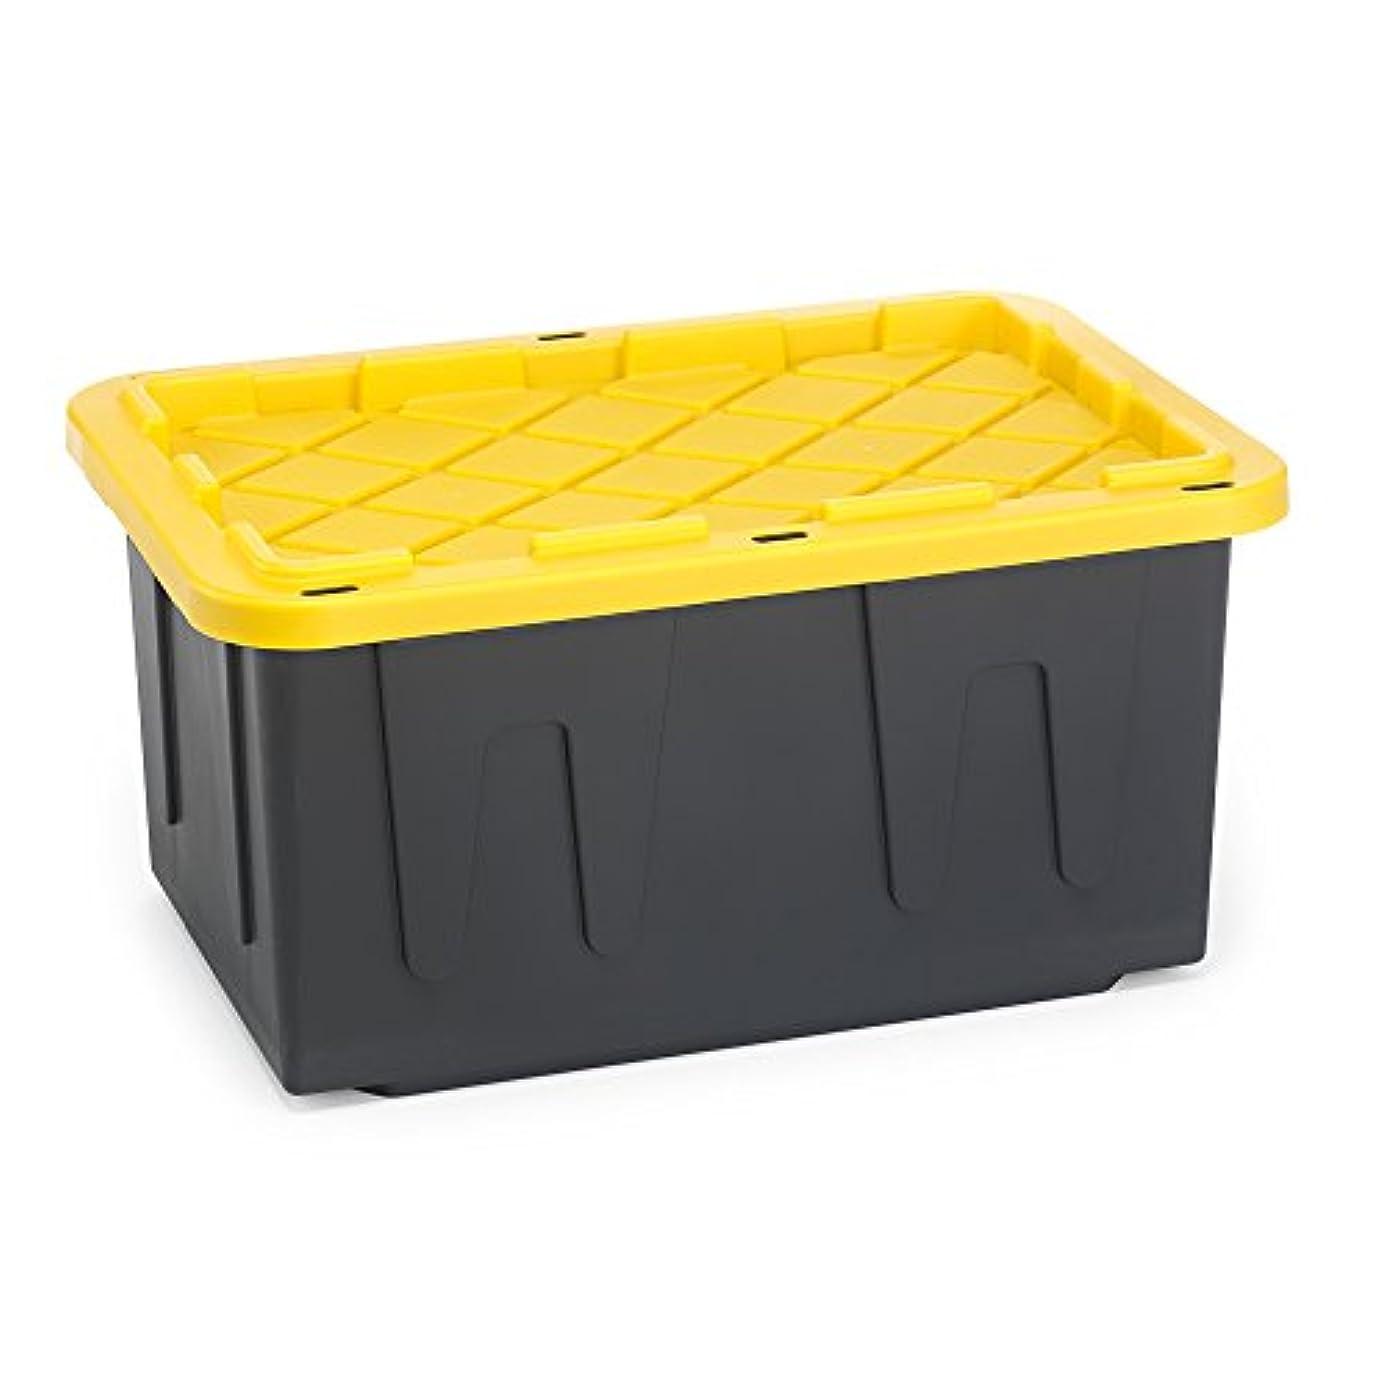 Homz 27 Gallon Durabilt Tough Storage Container, Black Base, Yellow Lid, Stackable, 4-Pack